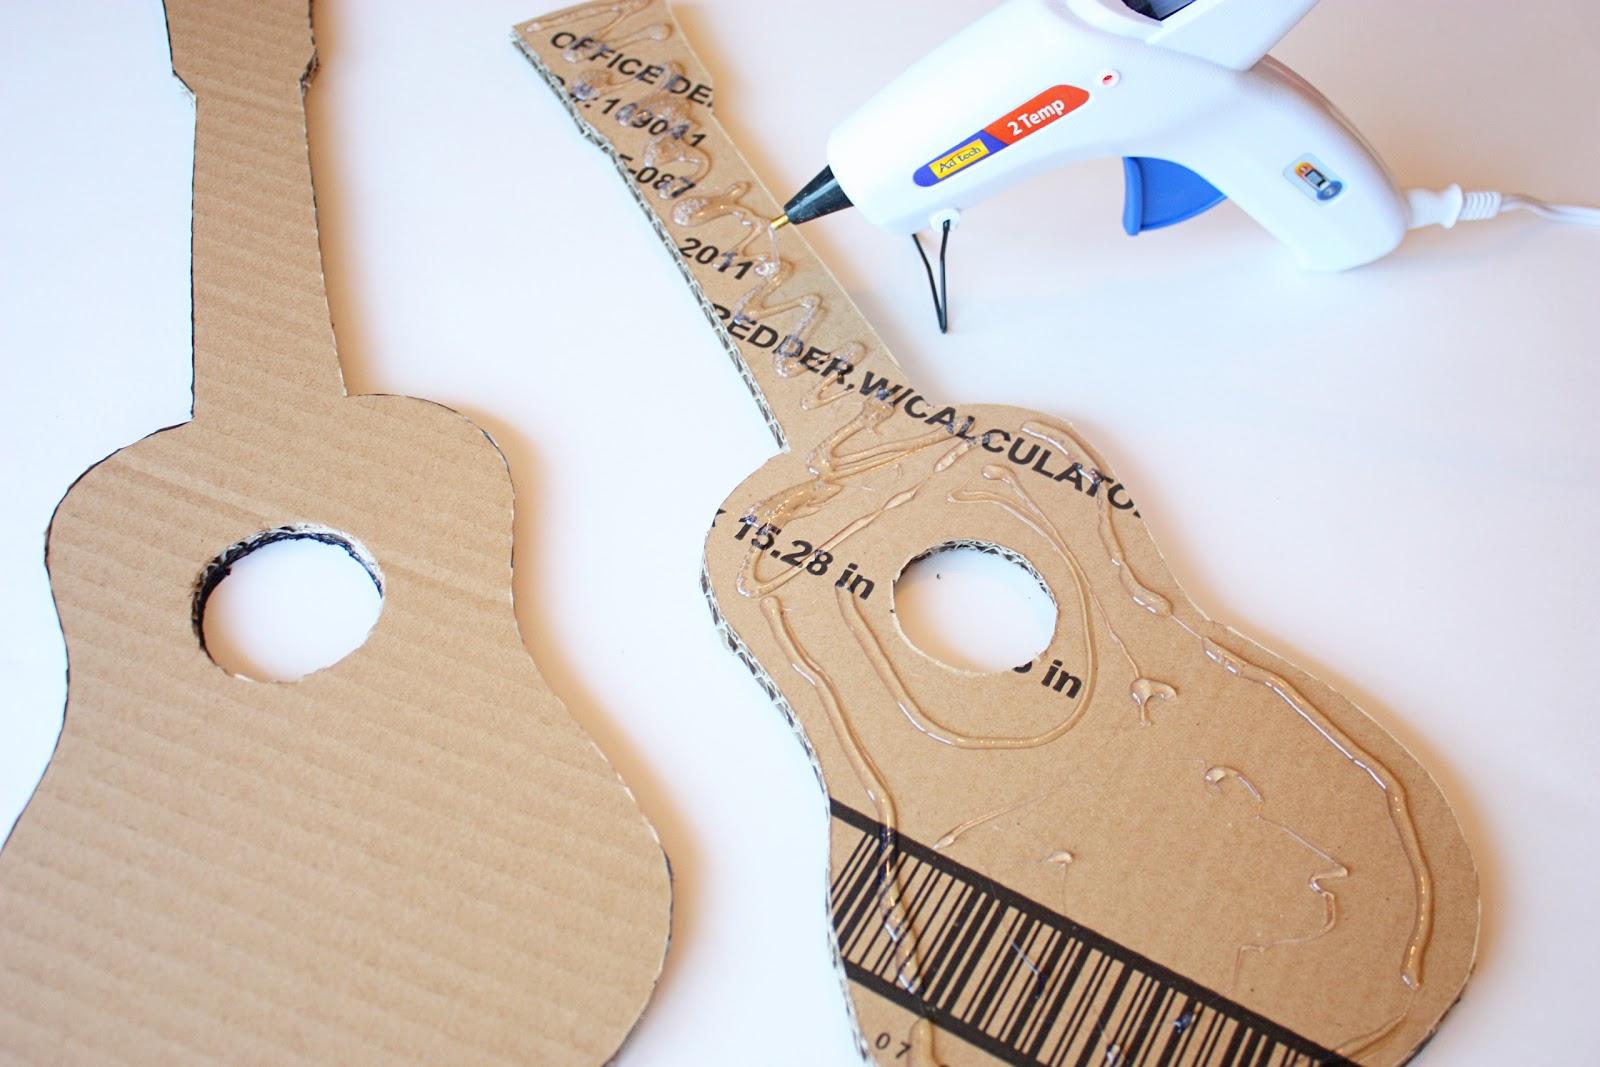 آموزش ساخت صندوقچه مقوایی Make Your Own Playable Cardboard Guitars Apartment Therapy